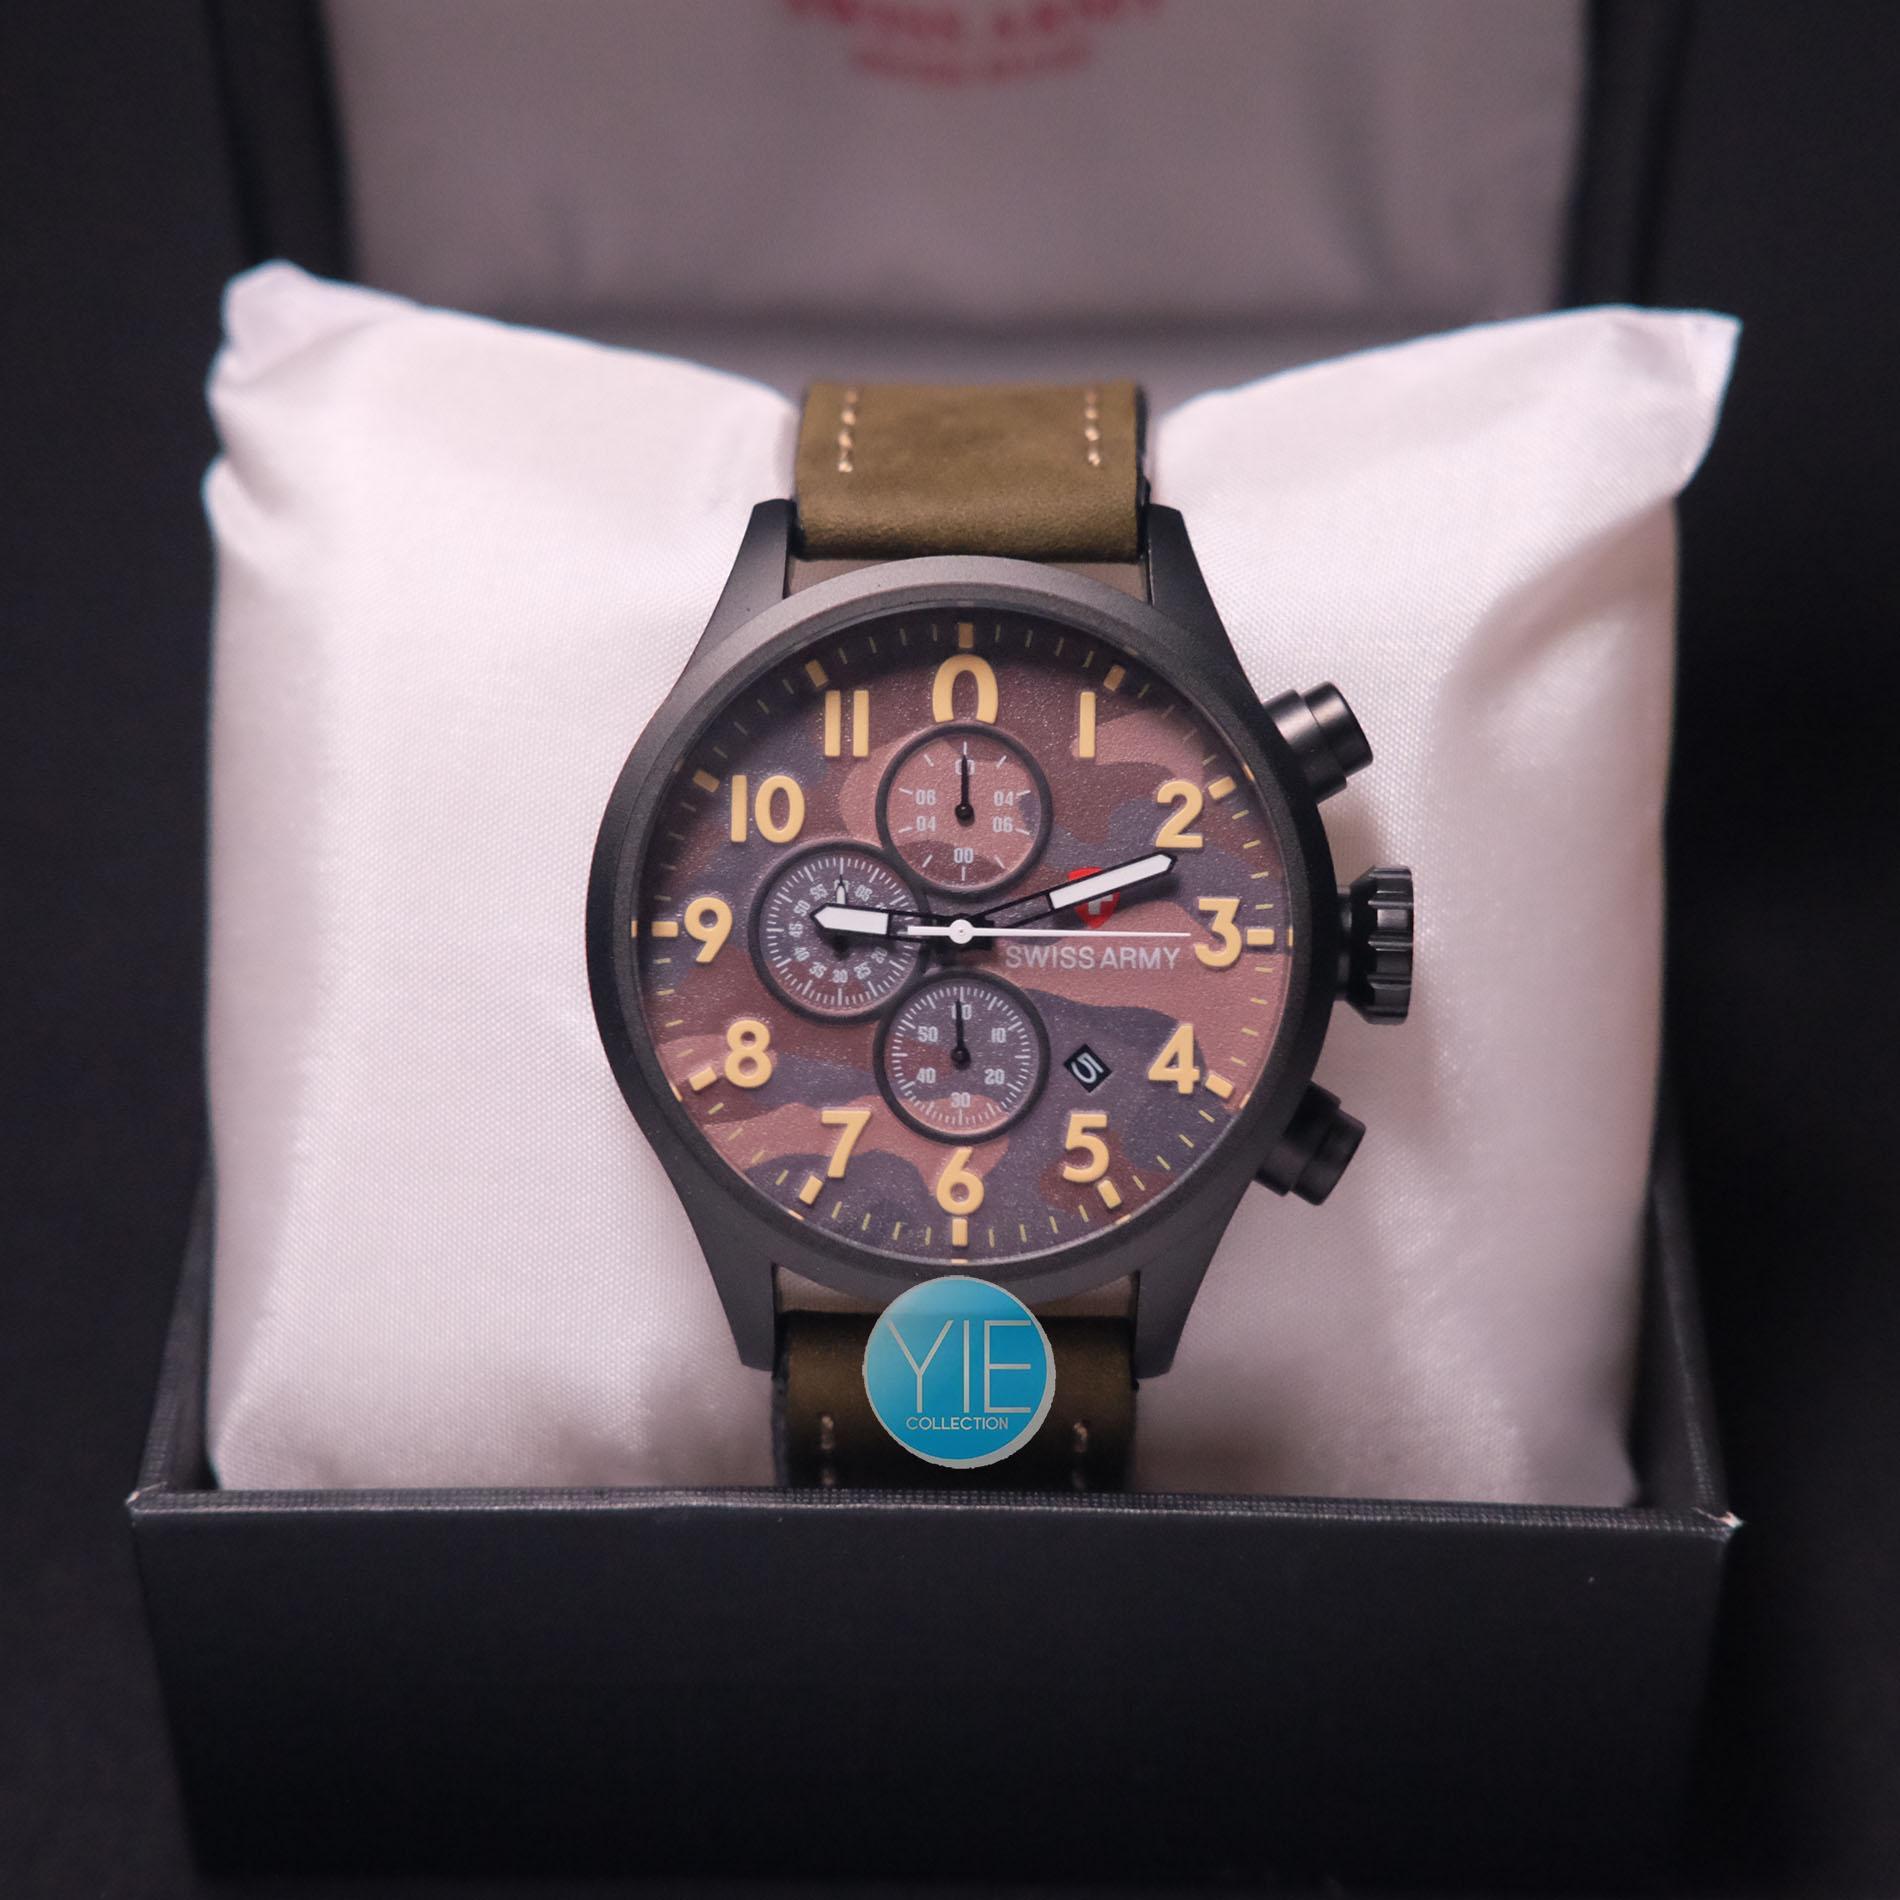 JPG Swiss Army Chrono Kulit Hijau Army Plat Coklat Tua 3 JPG Jam tangan